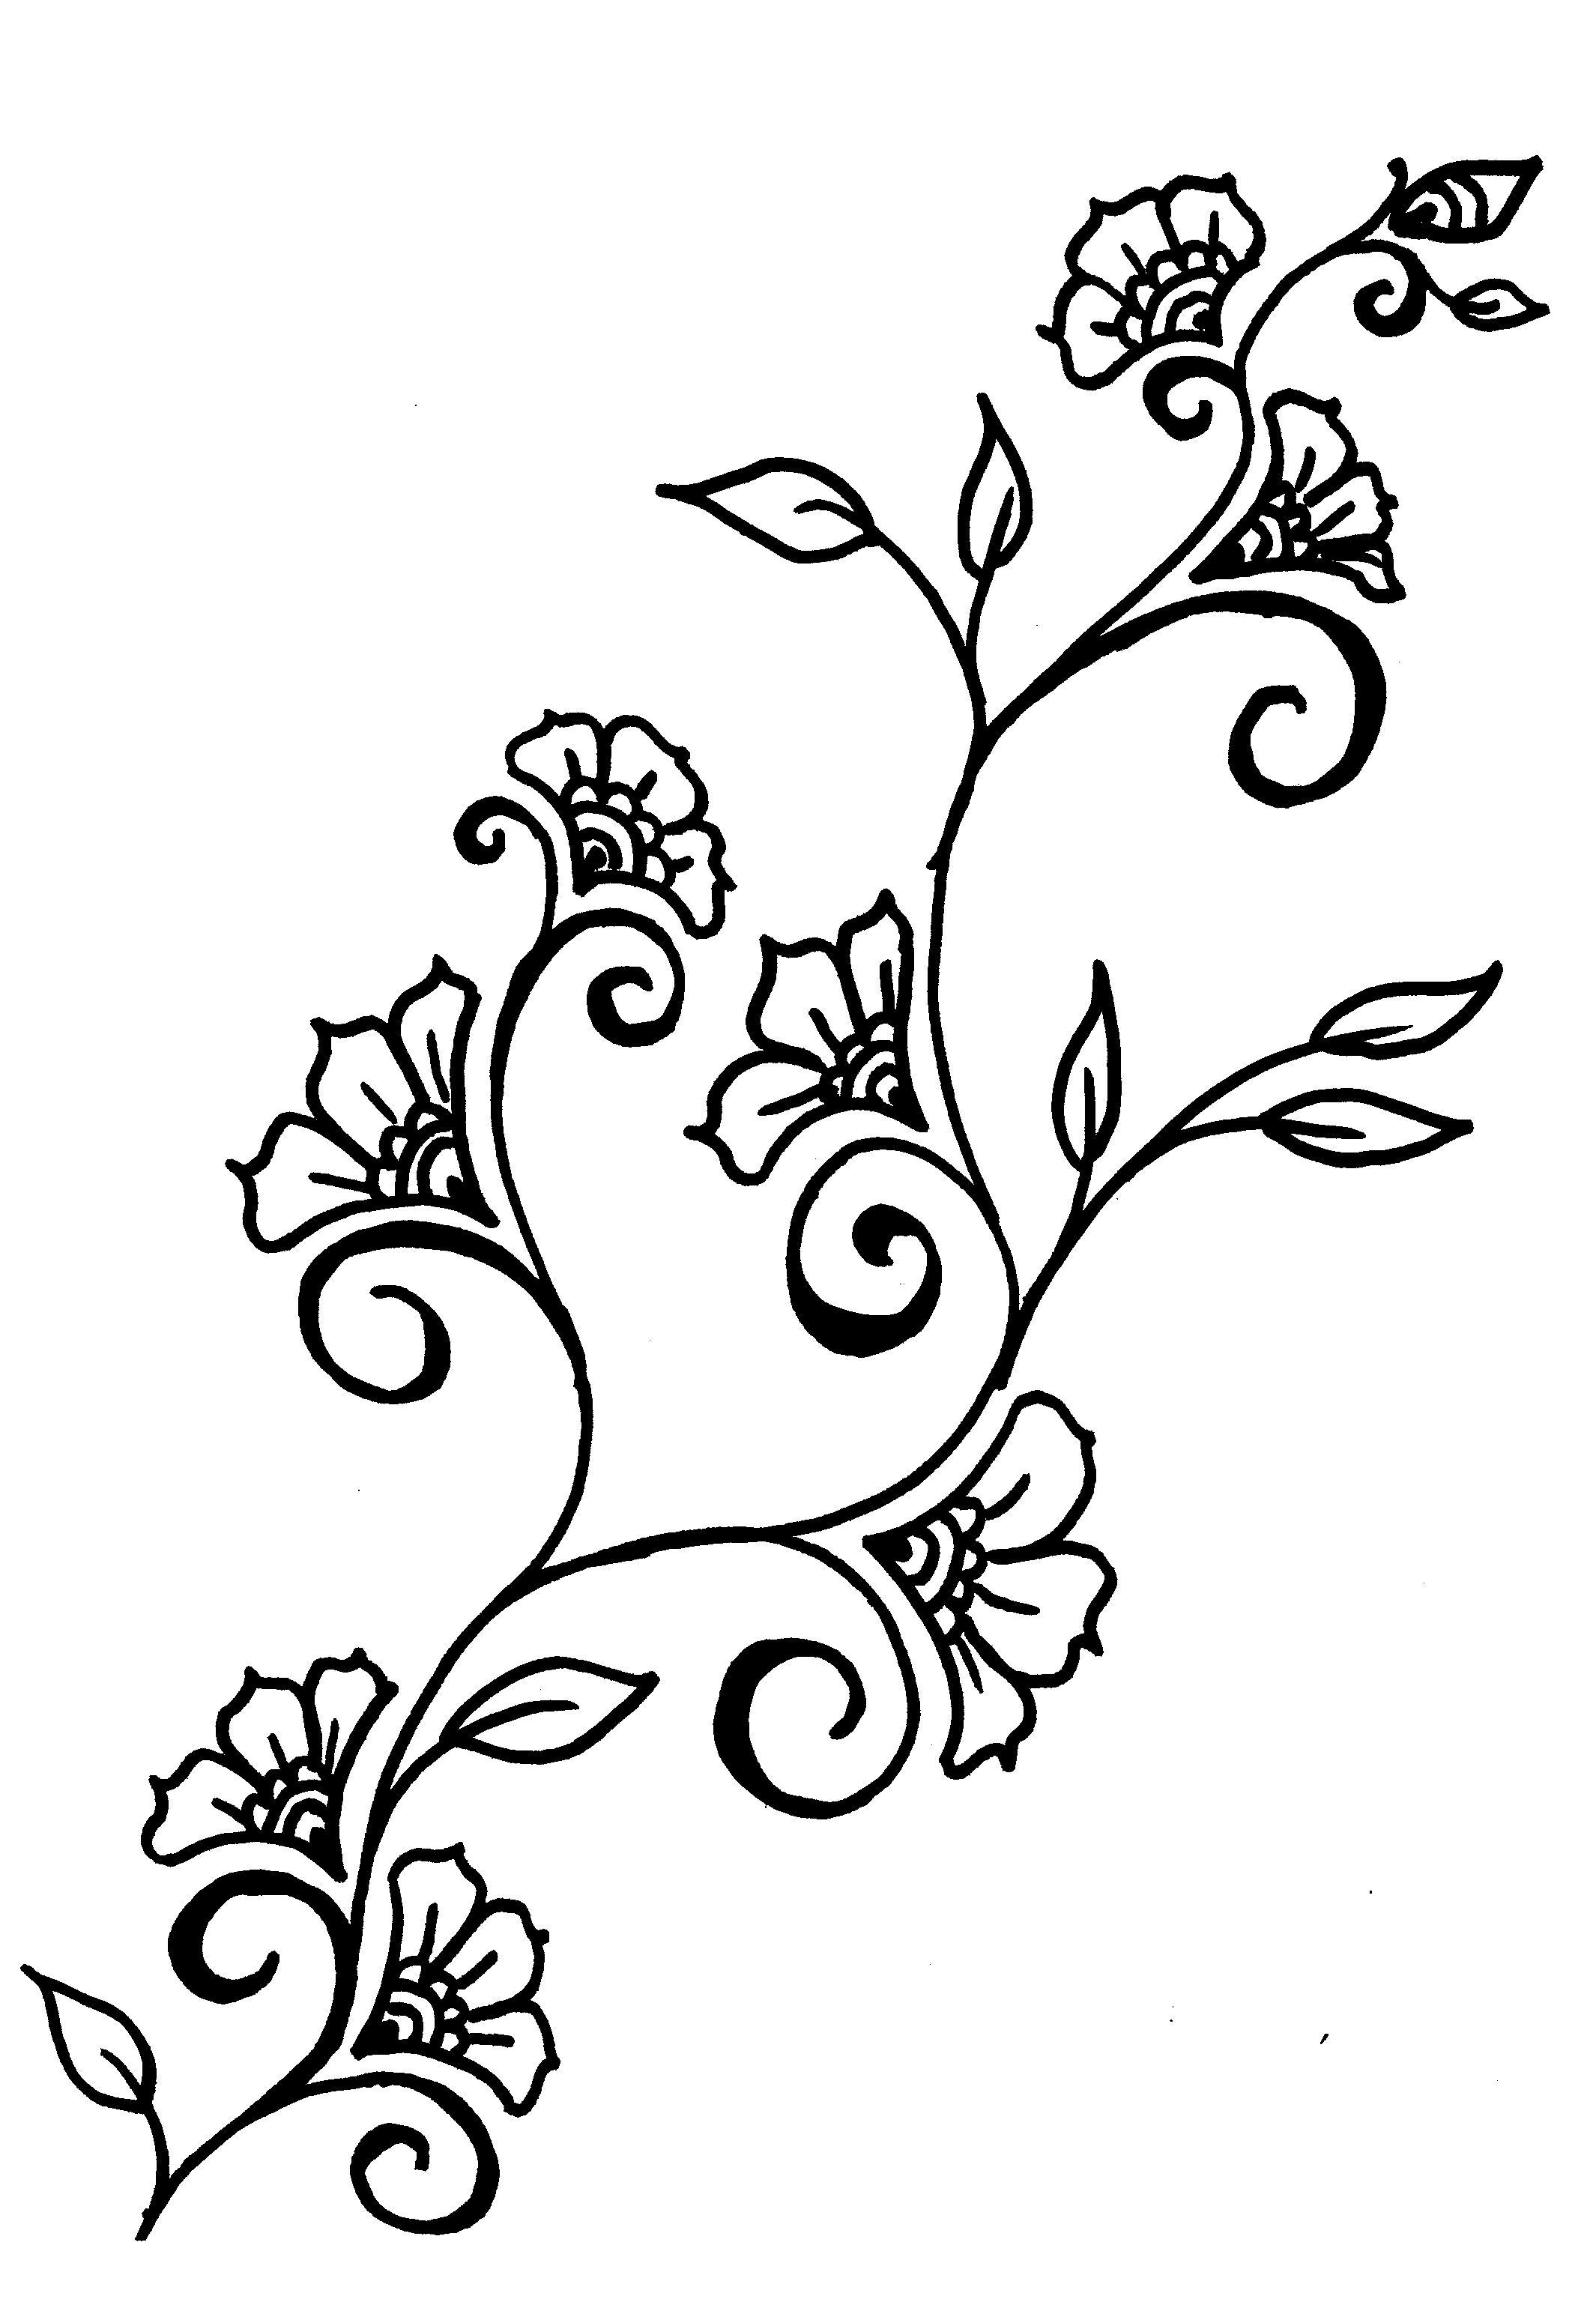 2130x3068 Drawings Of Rosd Vines Henna Inspired Design Ideas Leaves